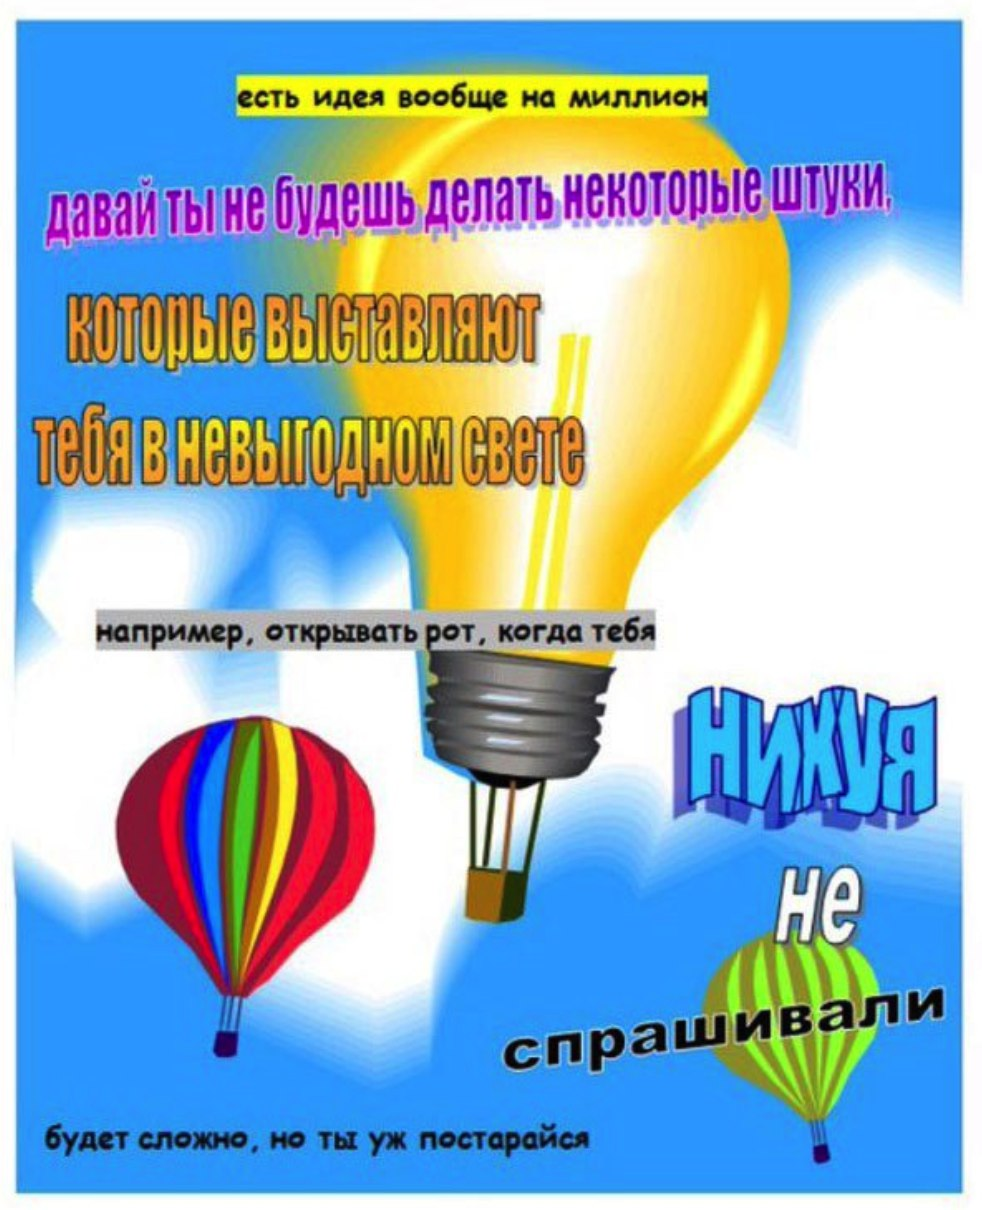 https://sun9-15.userapi.com/c623900/v623900331/a3b/D85ShEgtboY.jpg